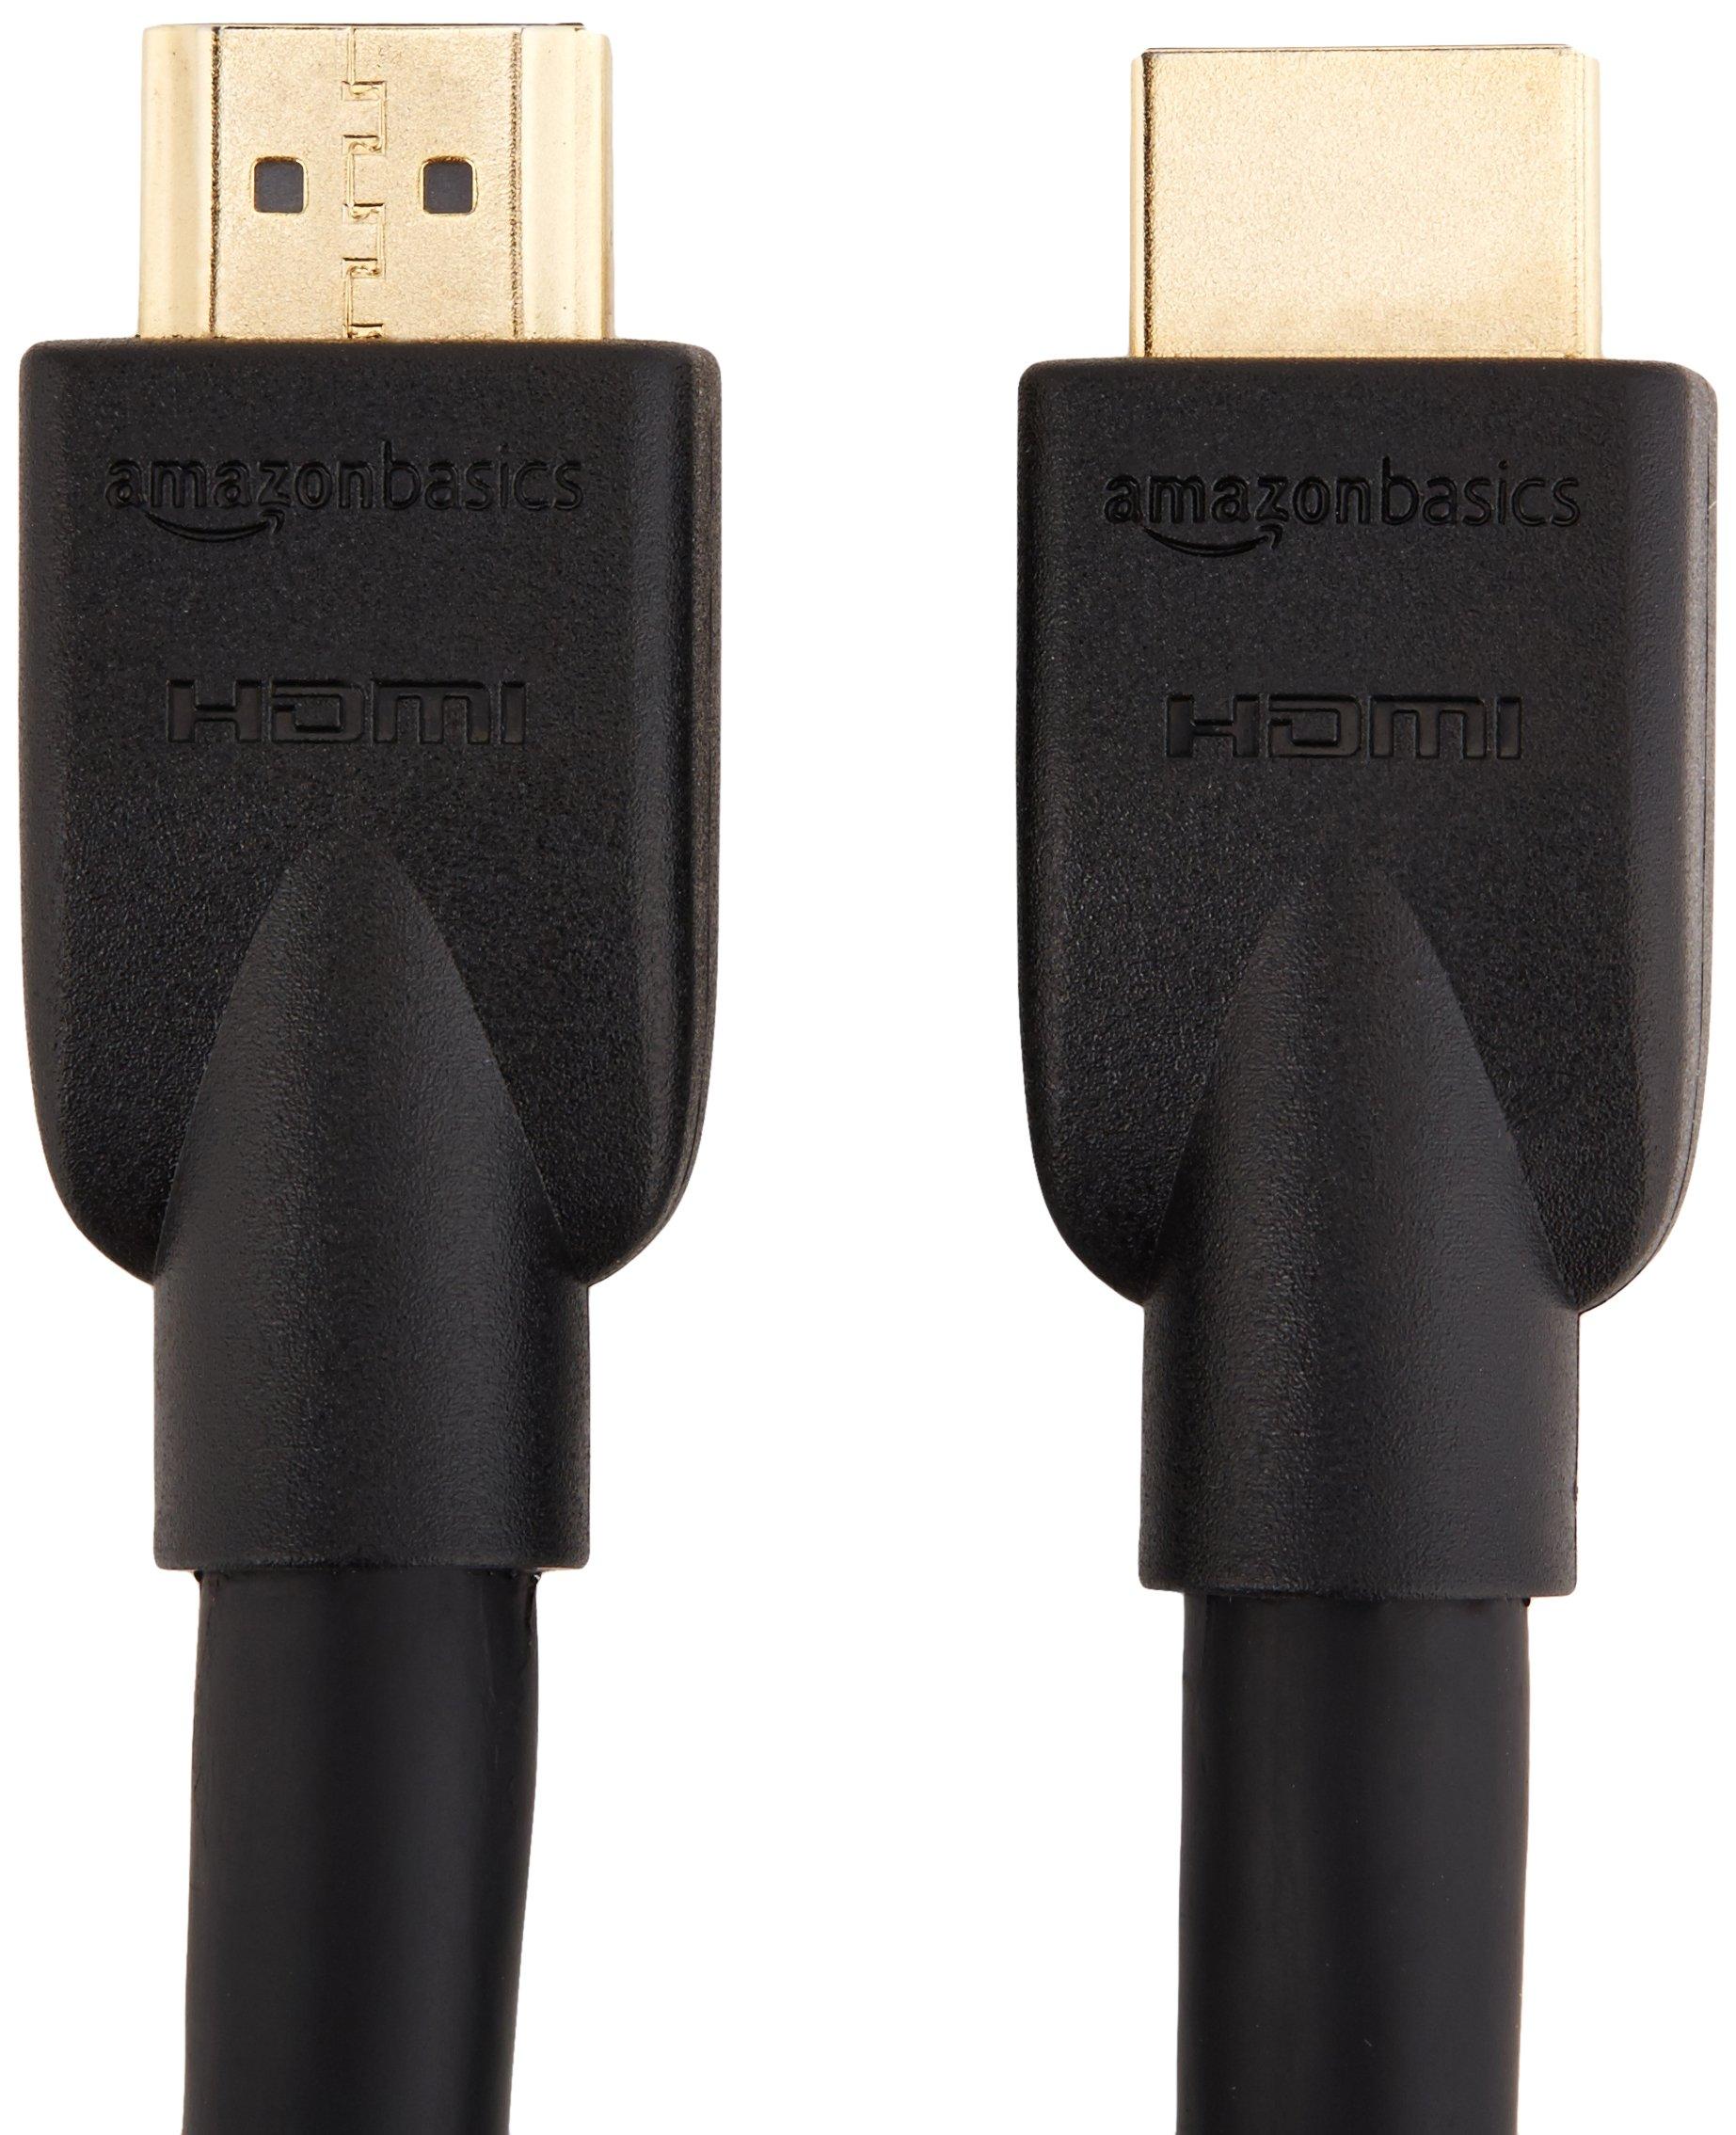 AmazonBasics TC4E_5 High-Speed HDMI Cable, 25 Feet, 5-Pack by AmazonBasics (Image #5)